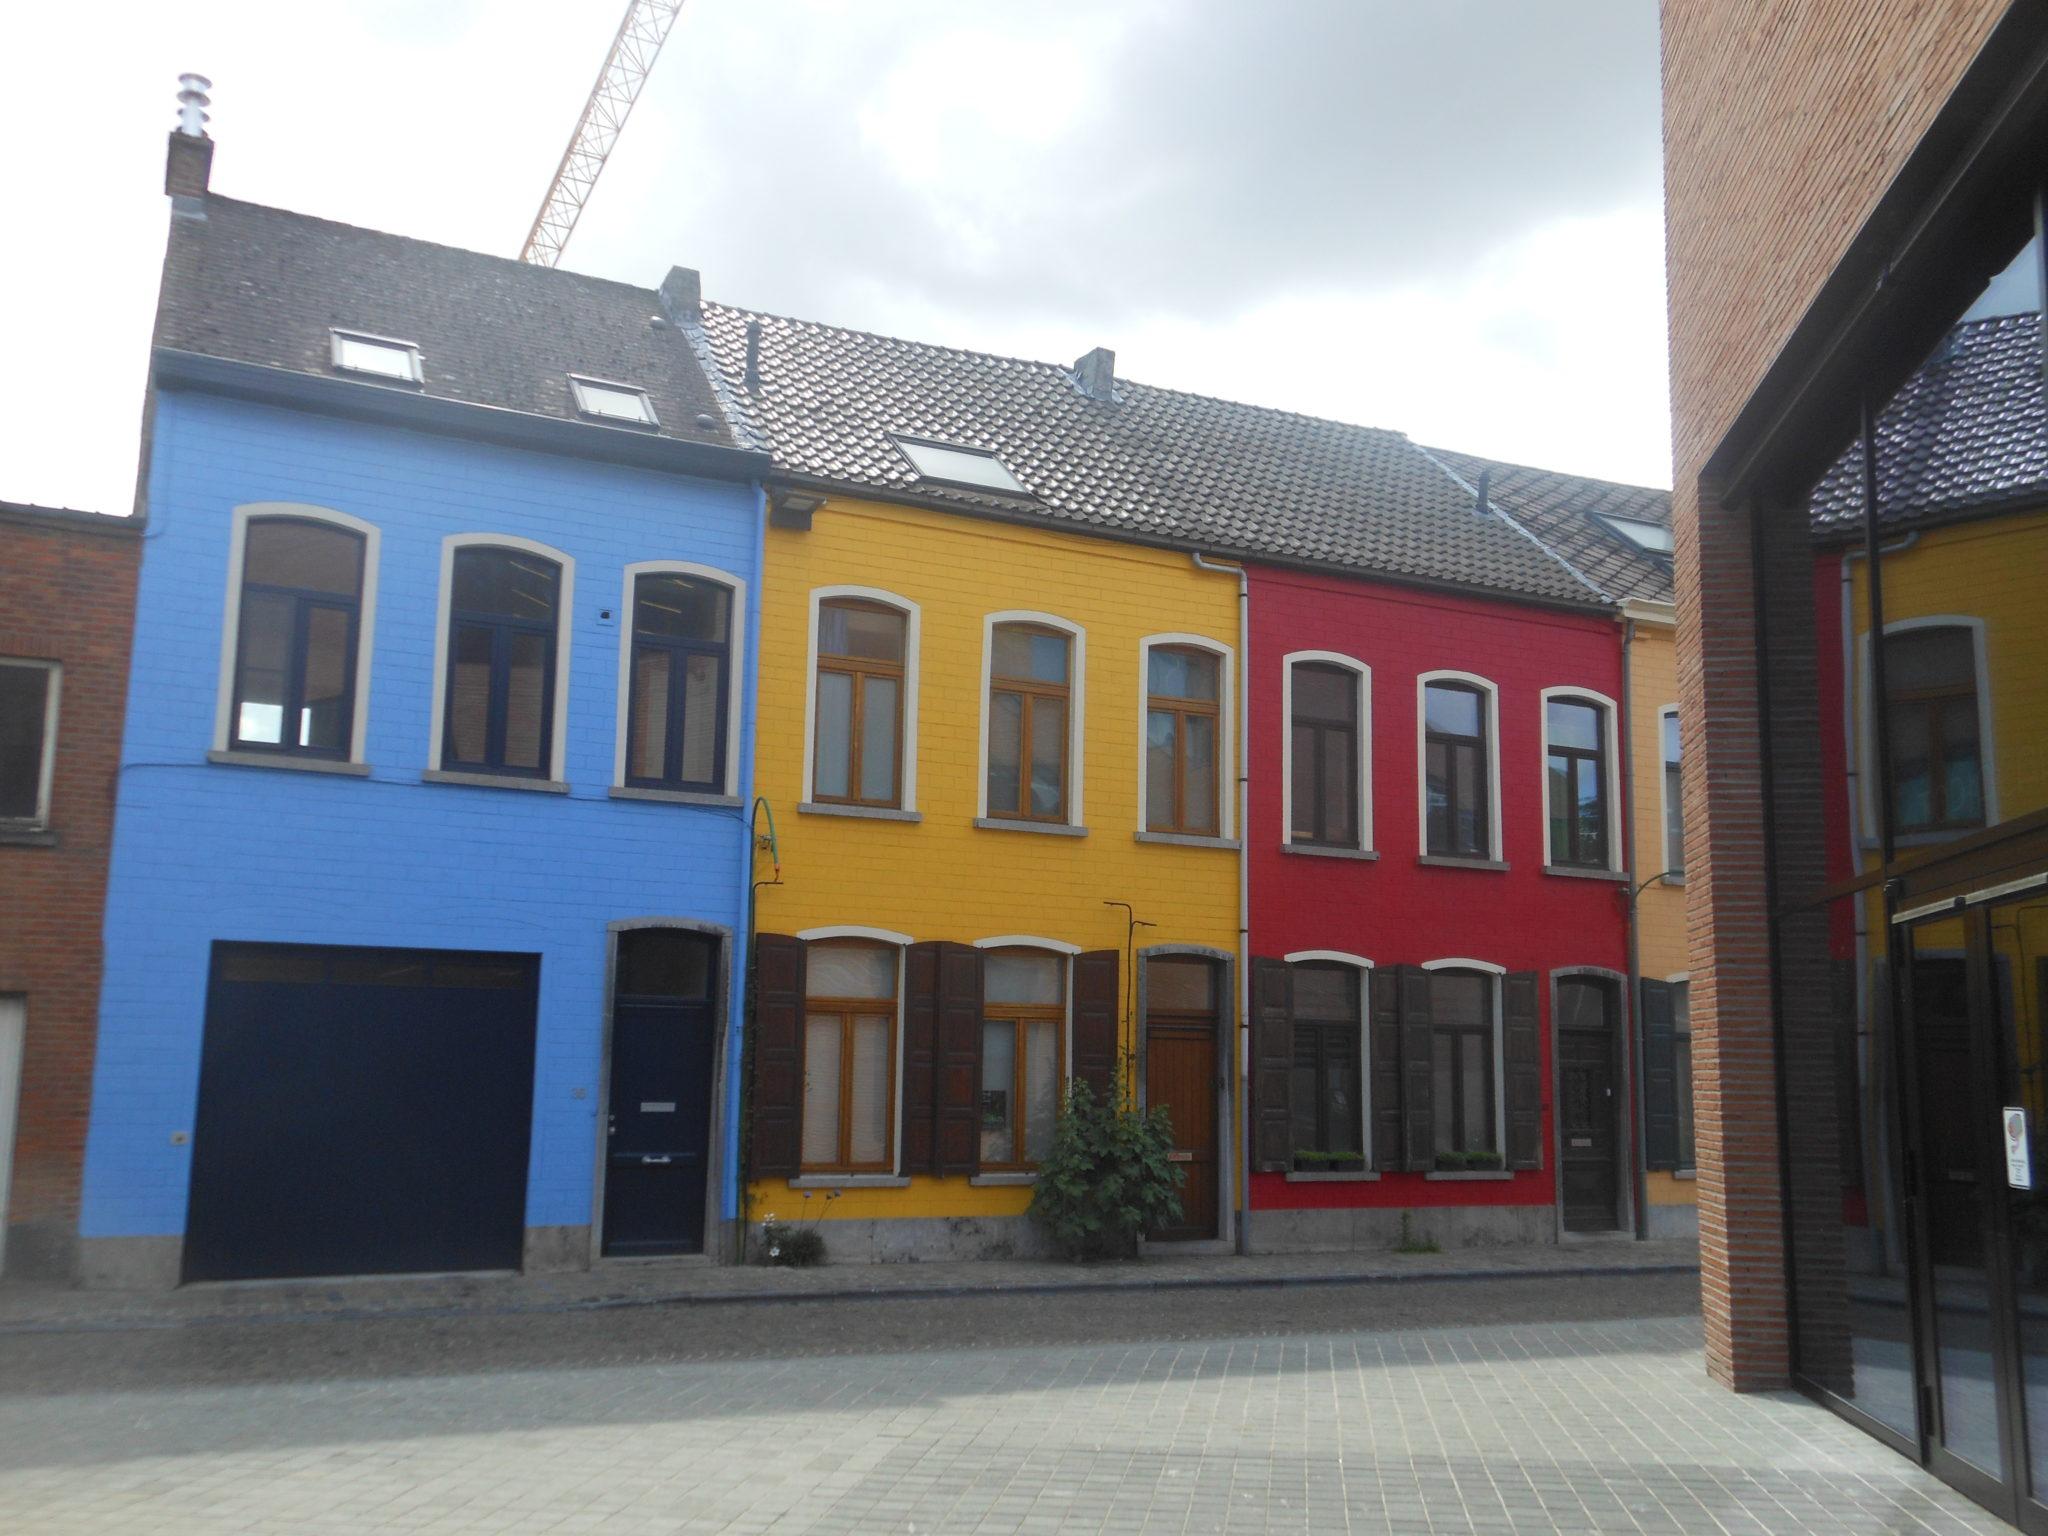 Kolorowe domy w Aalst